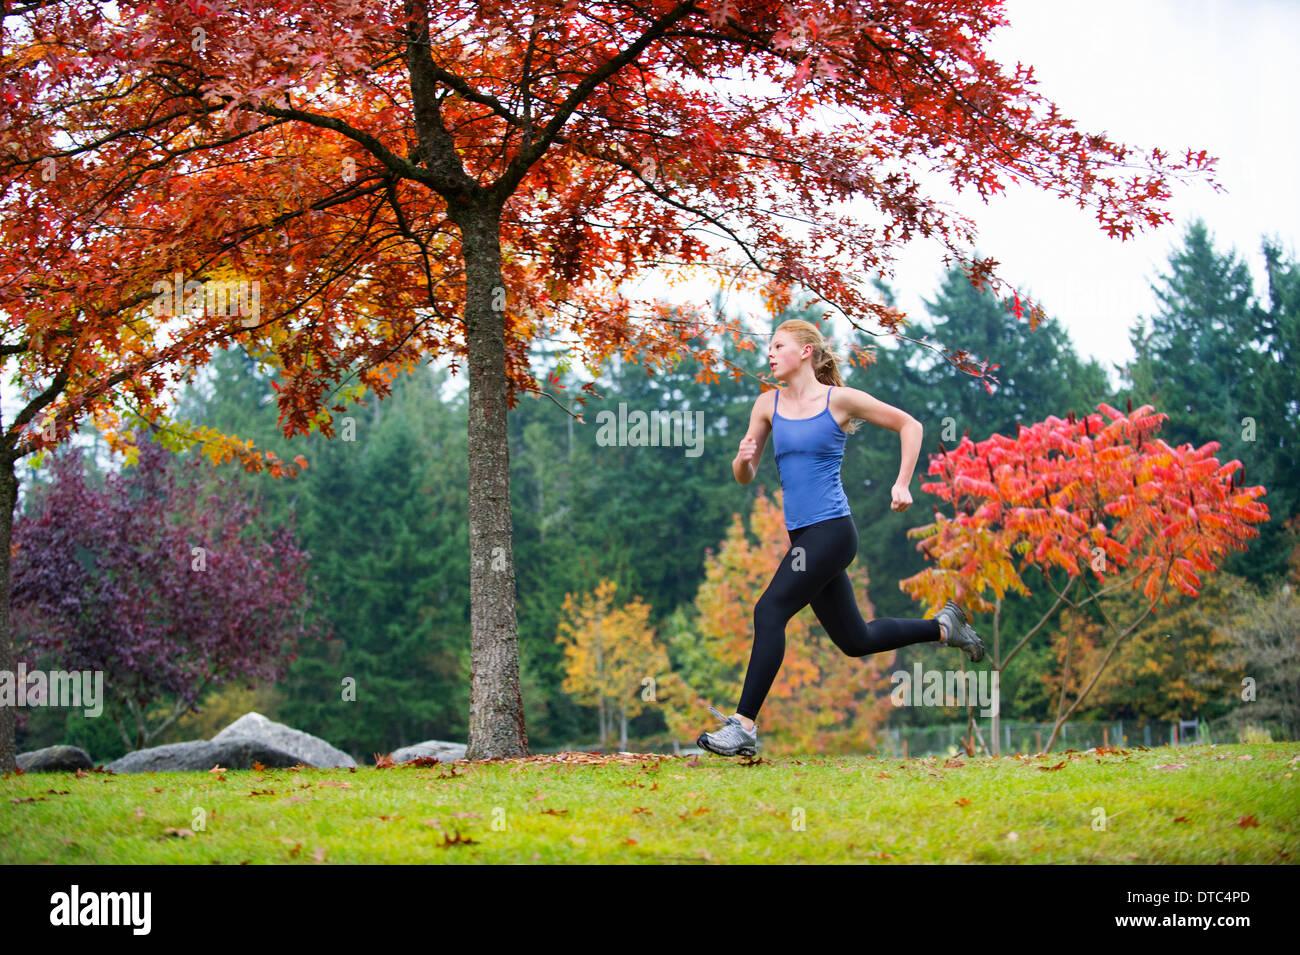 Mädchen im Wald joggen Stockbild